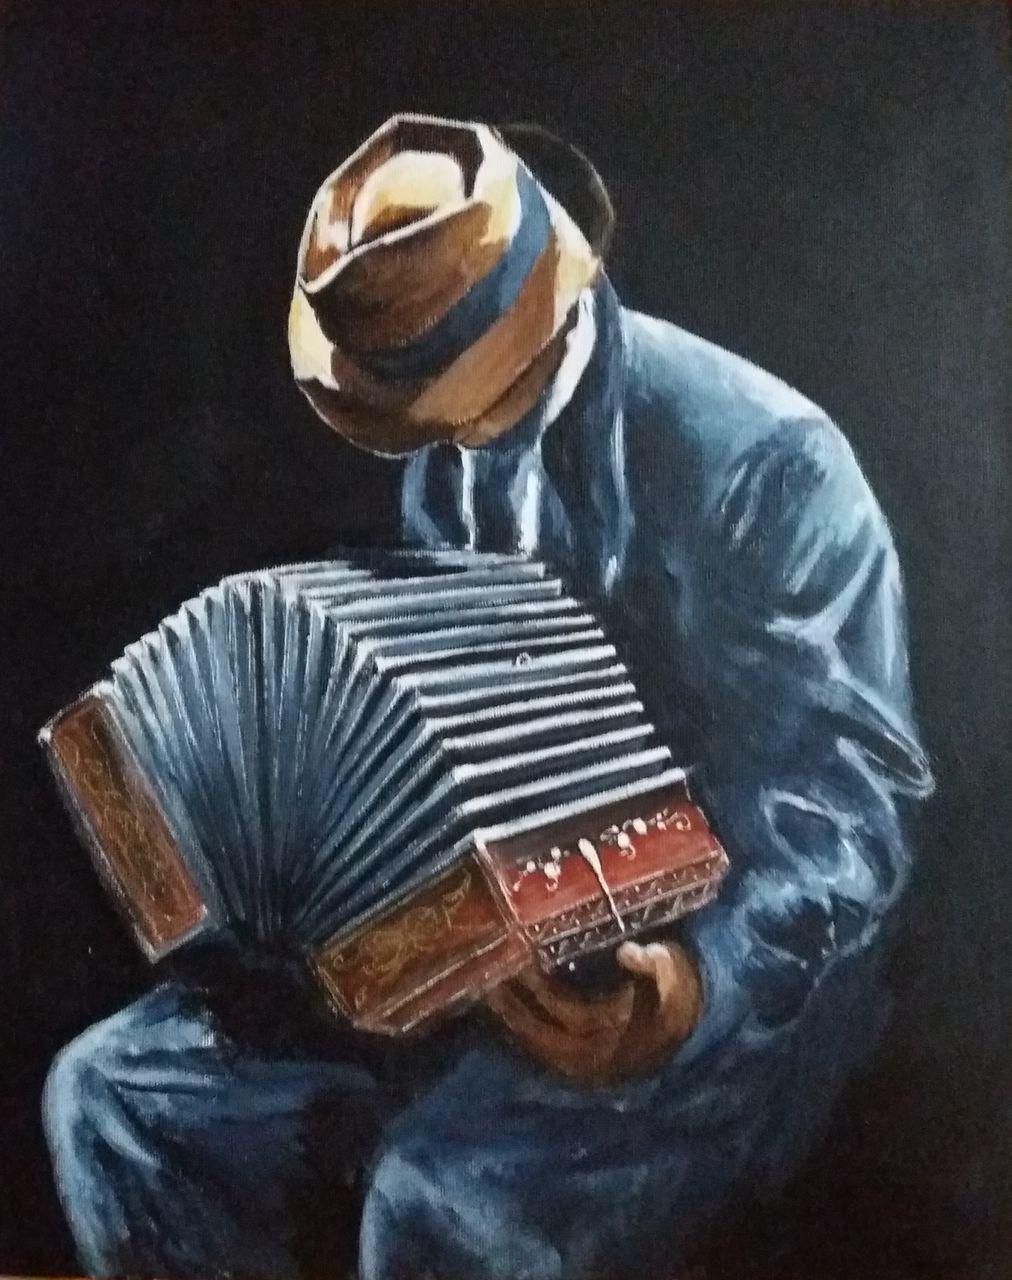 YolandedeComblesdeNayves accordéoniste